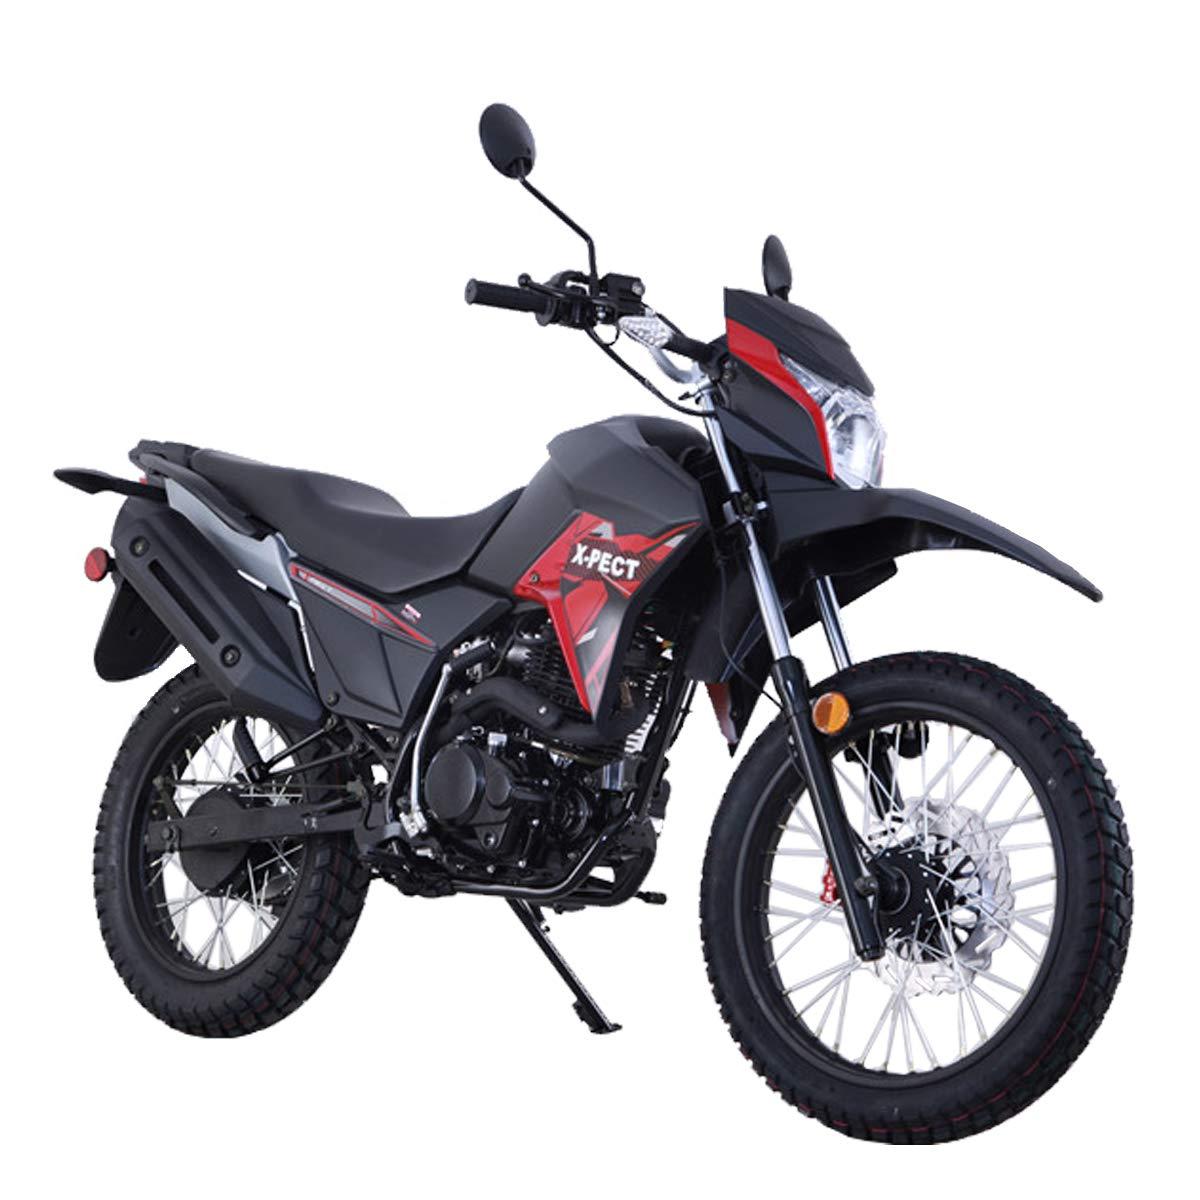 Goggle and Handgrip X-Pro 200cc Motorcycle Bike Adult Dirt Bike 200cc Street Bike Dirt Bikes with Gloves